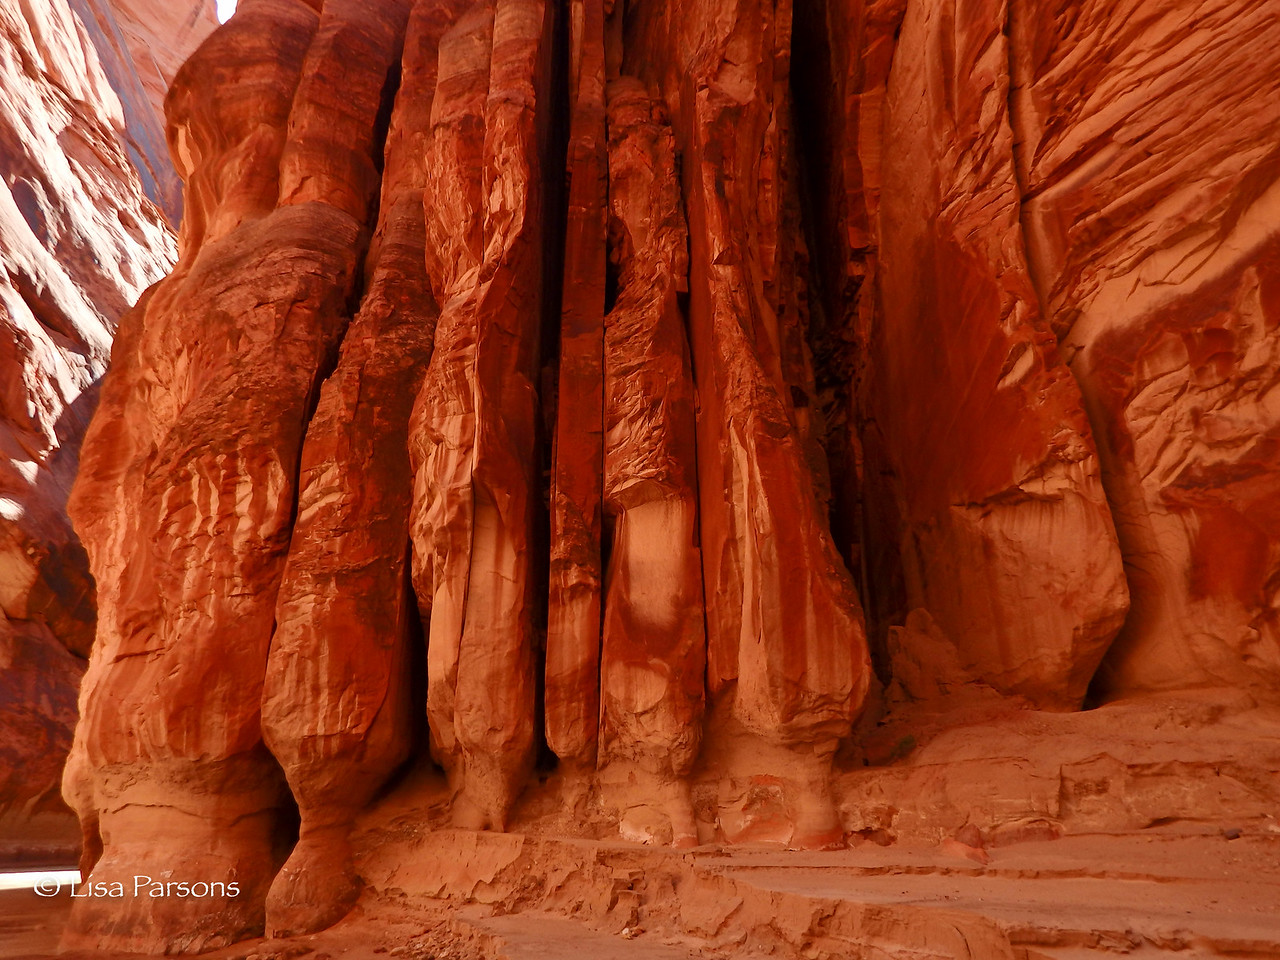 Pipe Organ Rocks